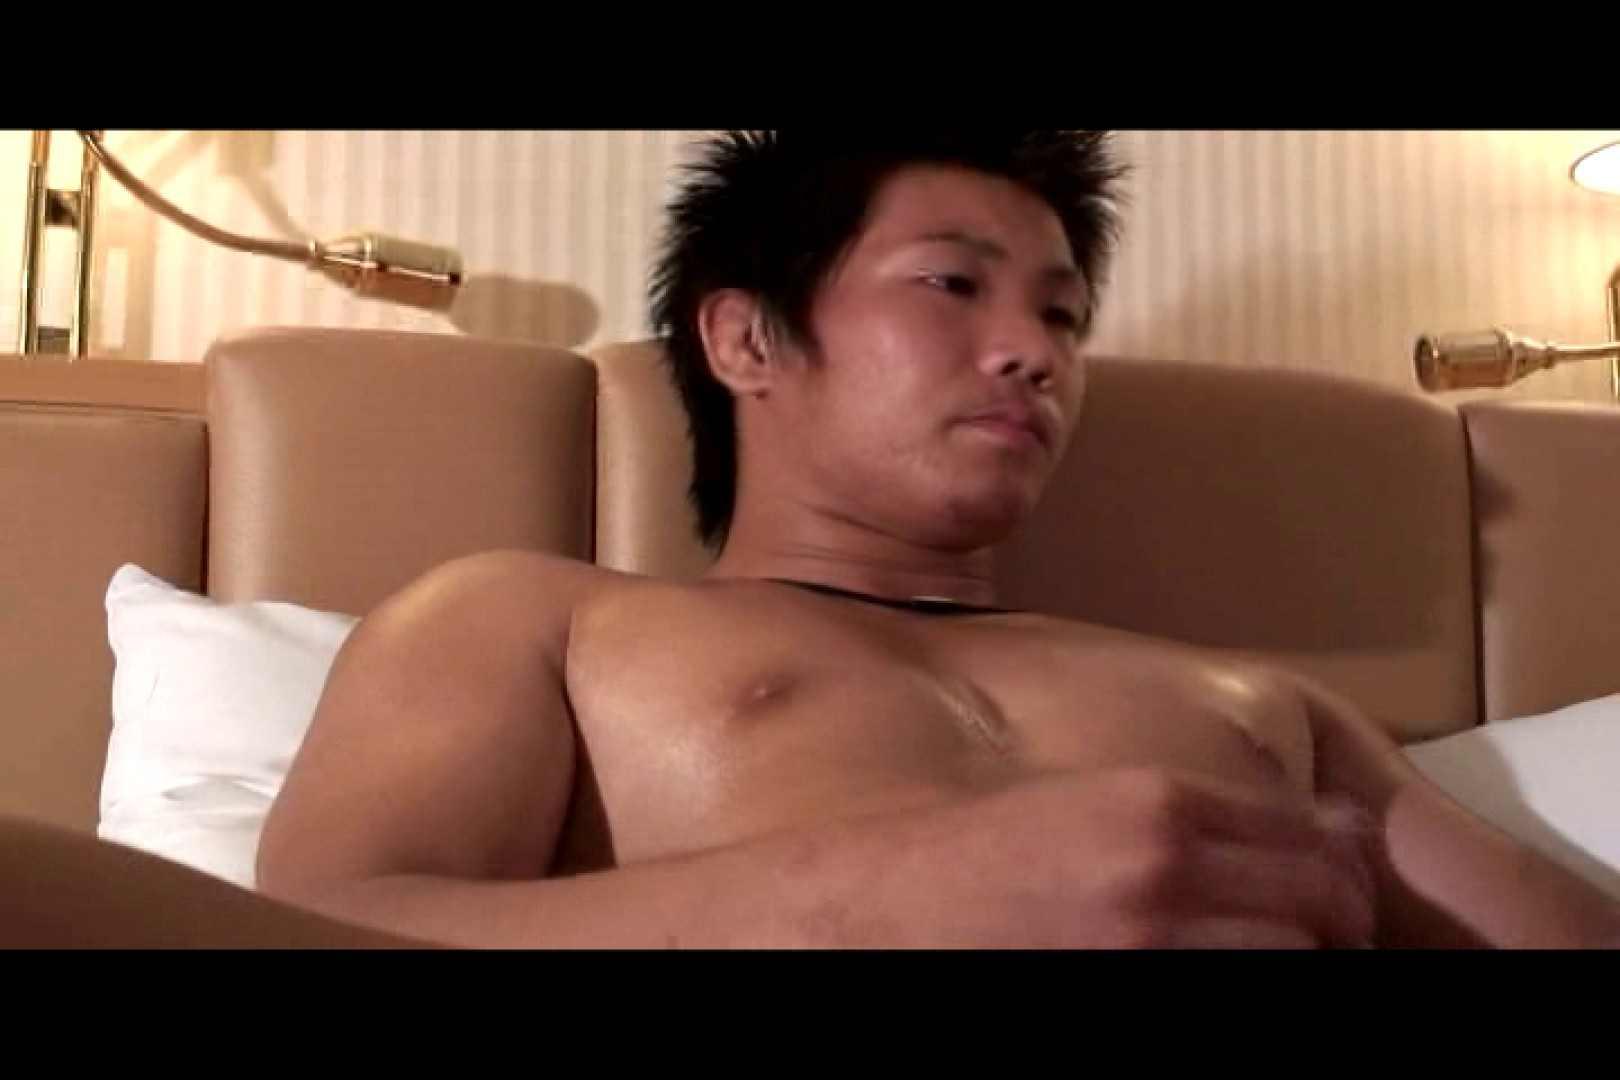 Bistro「イケメン」~Mokkori和風仕立て~vol.03 メンズの着替え ゲイエロ動画 67画像 7